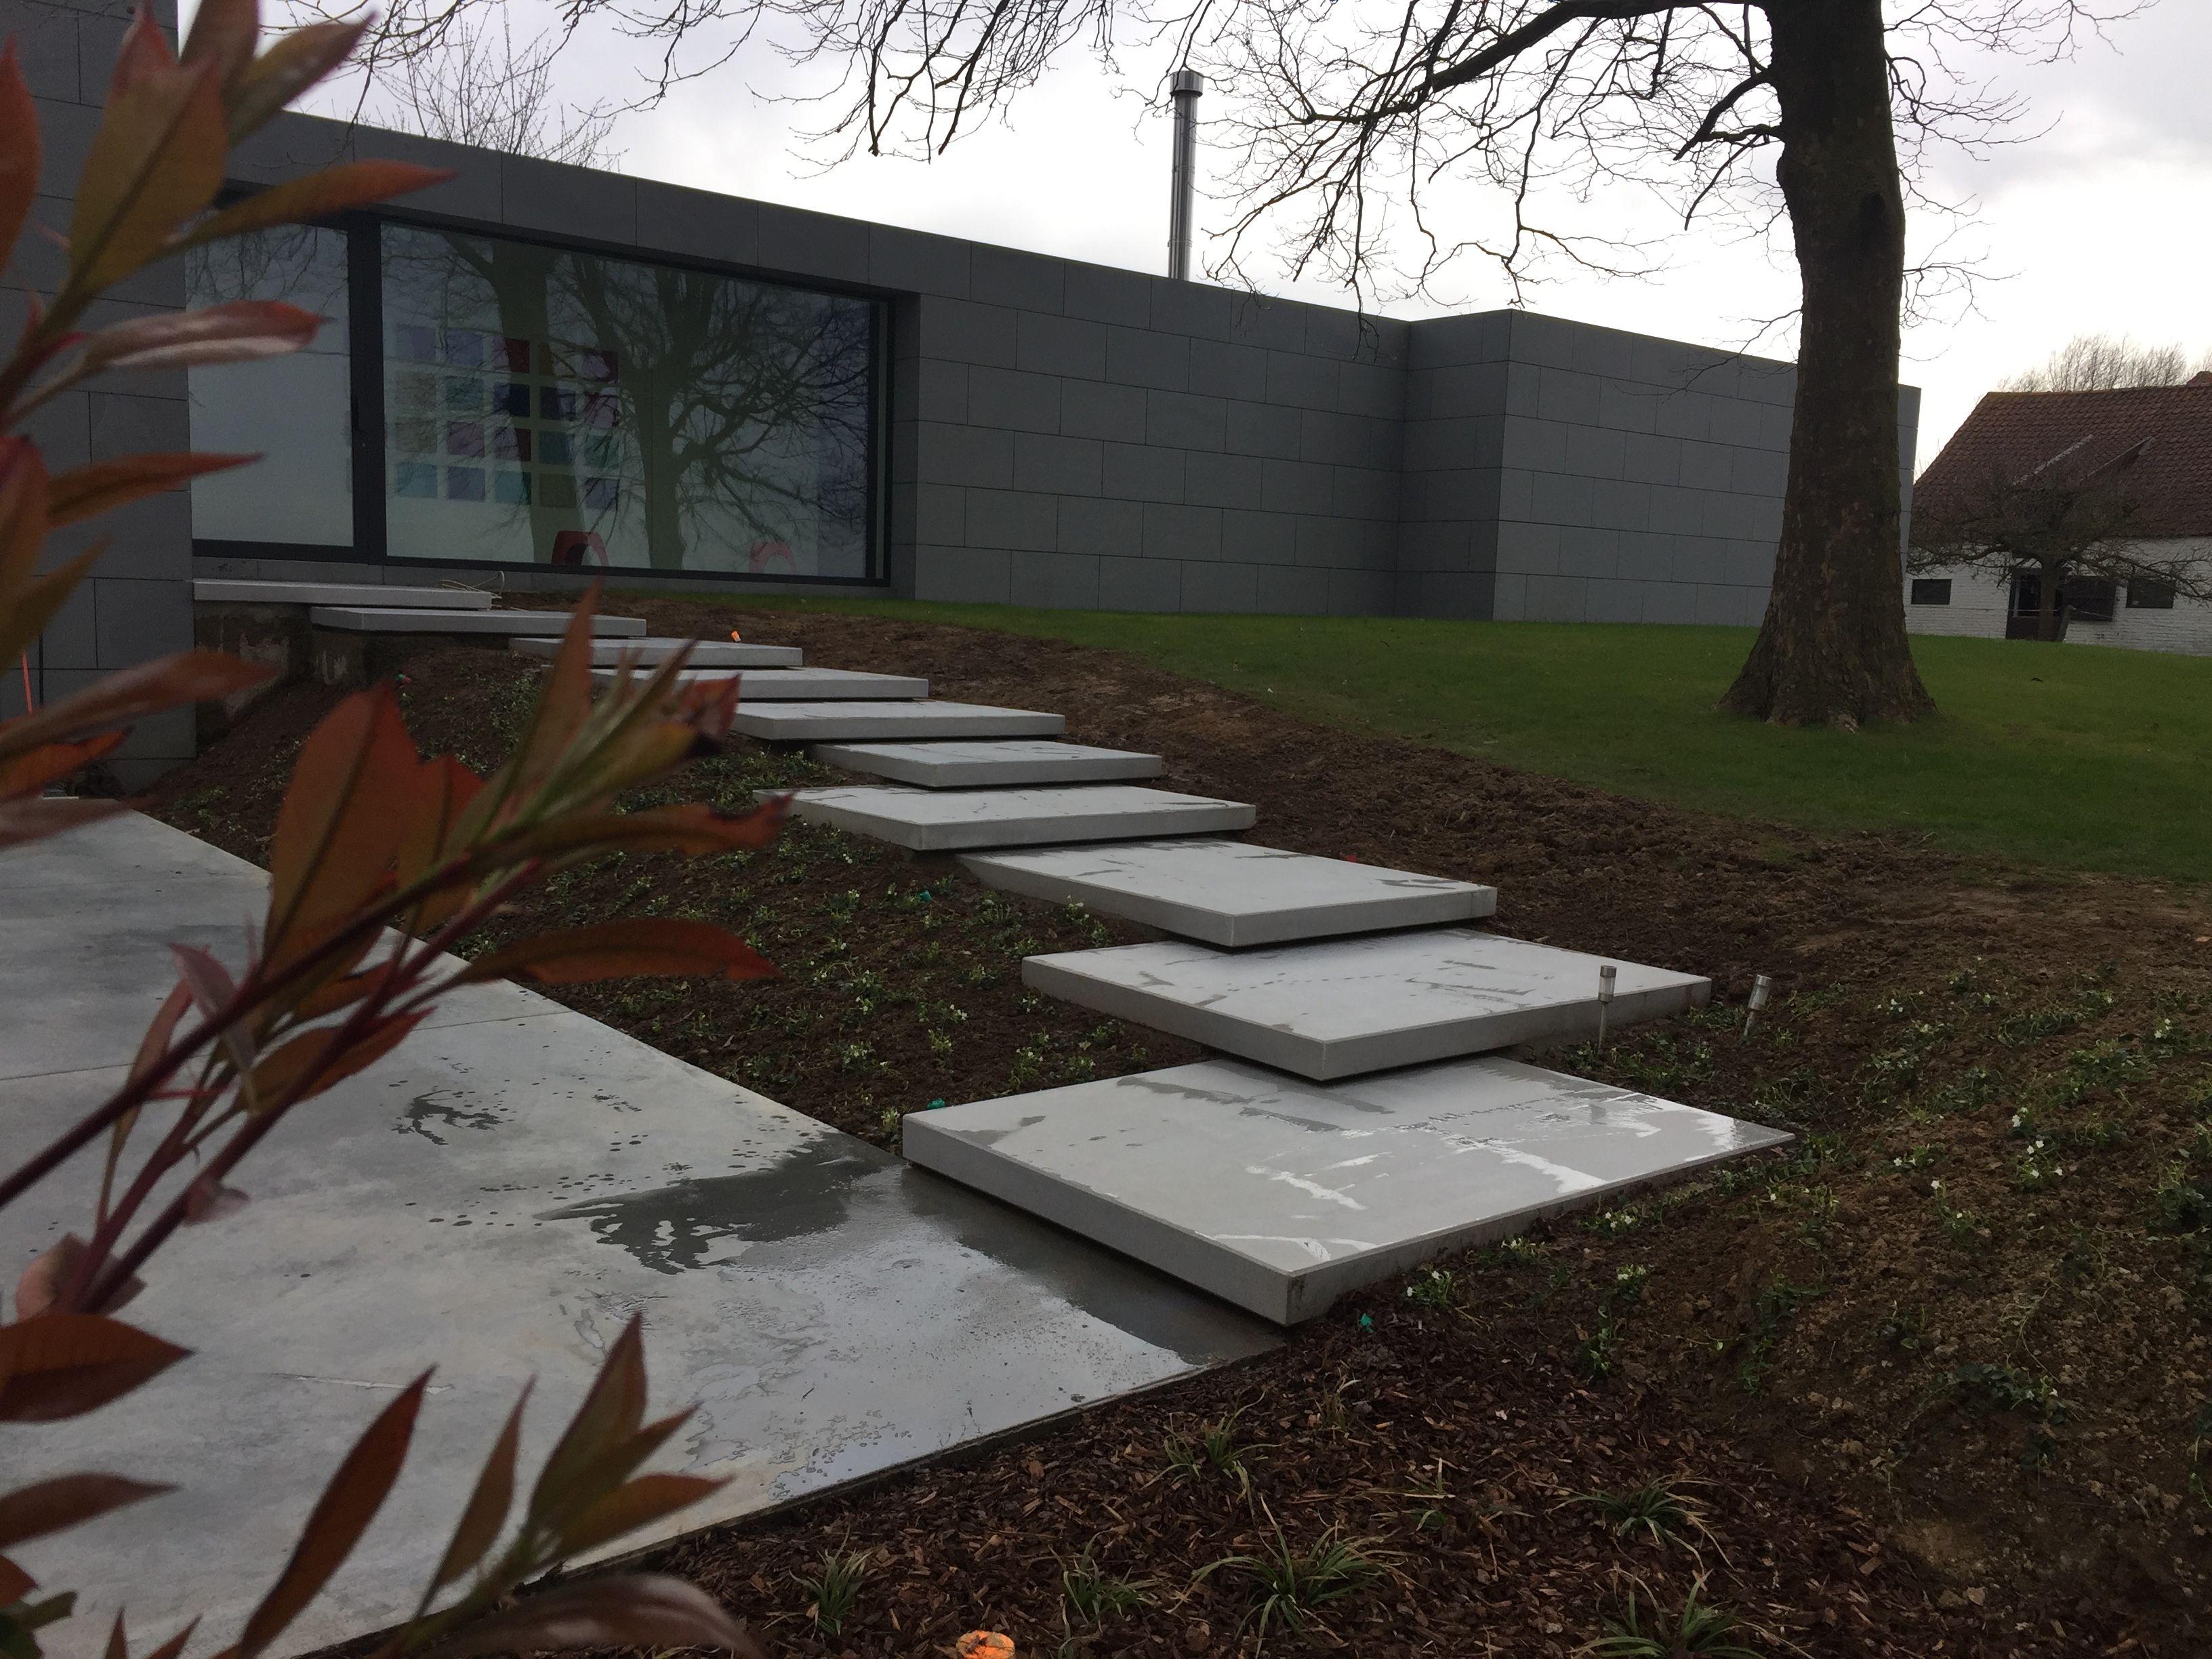 Megasmooth object trap als toegang van een ultra moderne woning